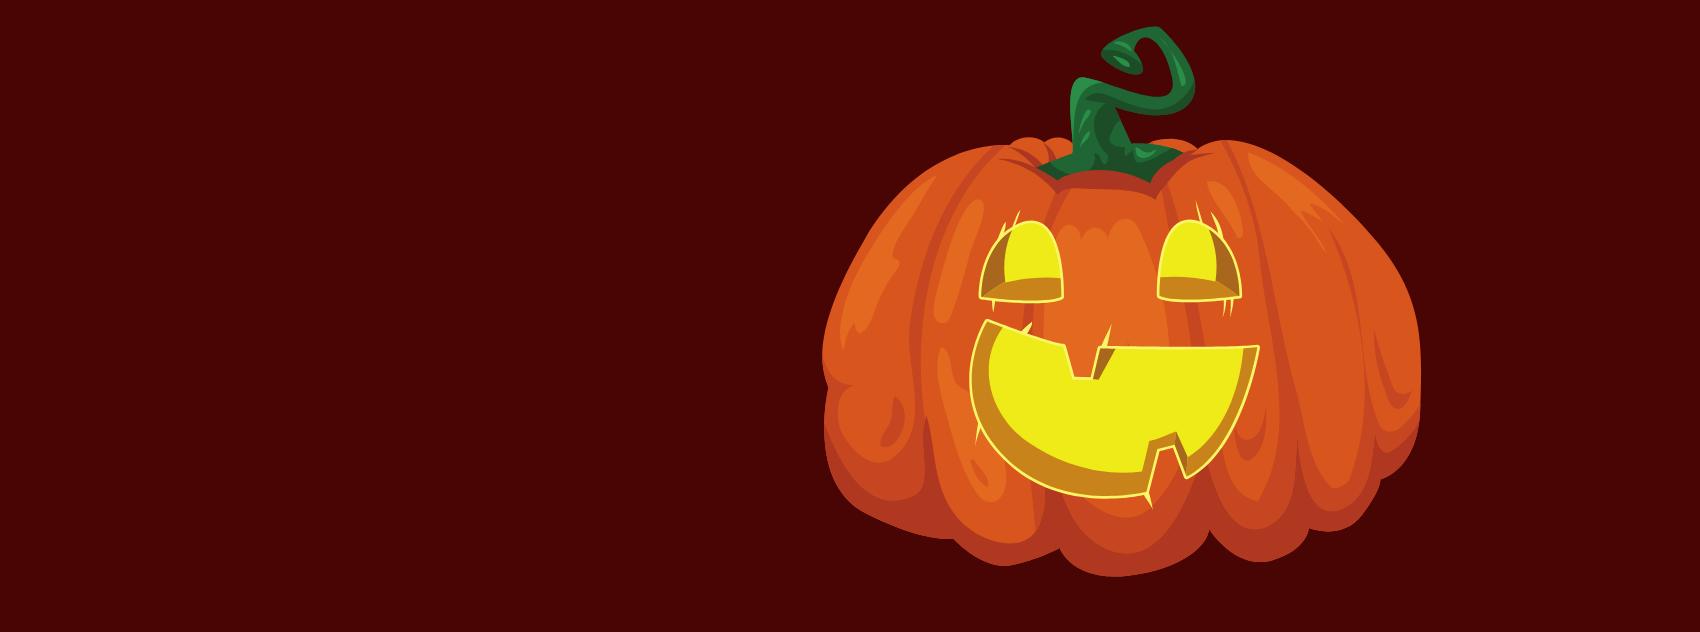 Halloween heroimage 2